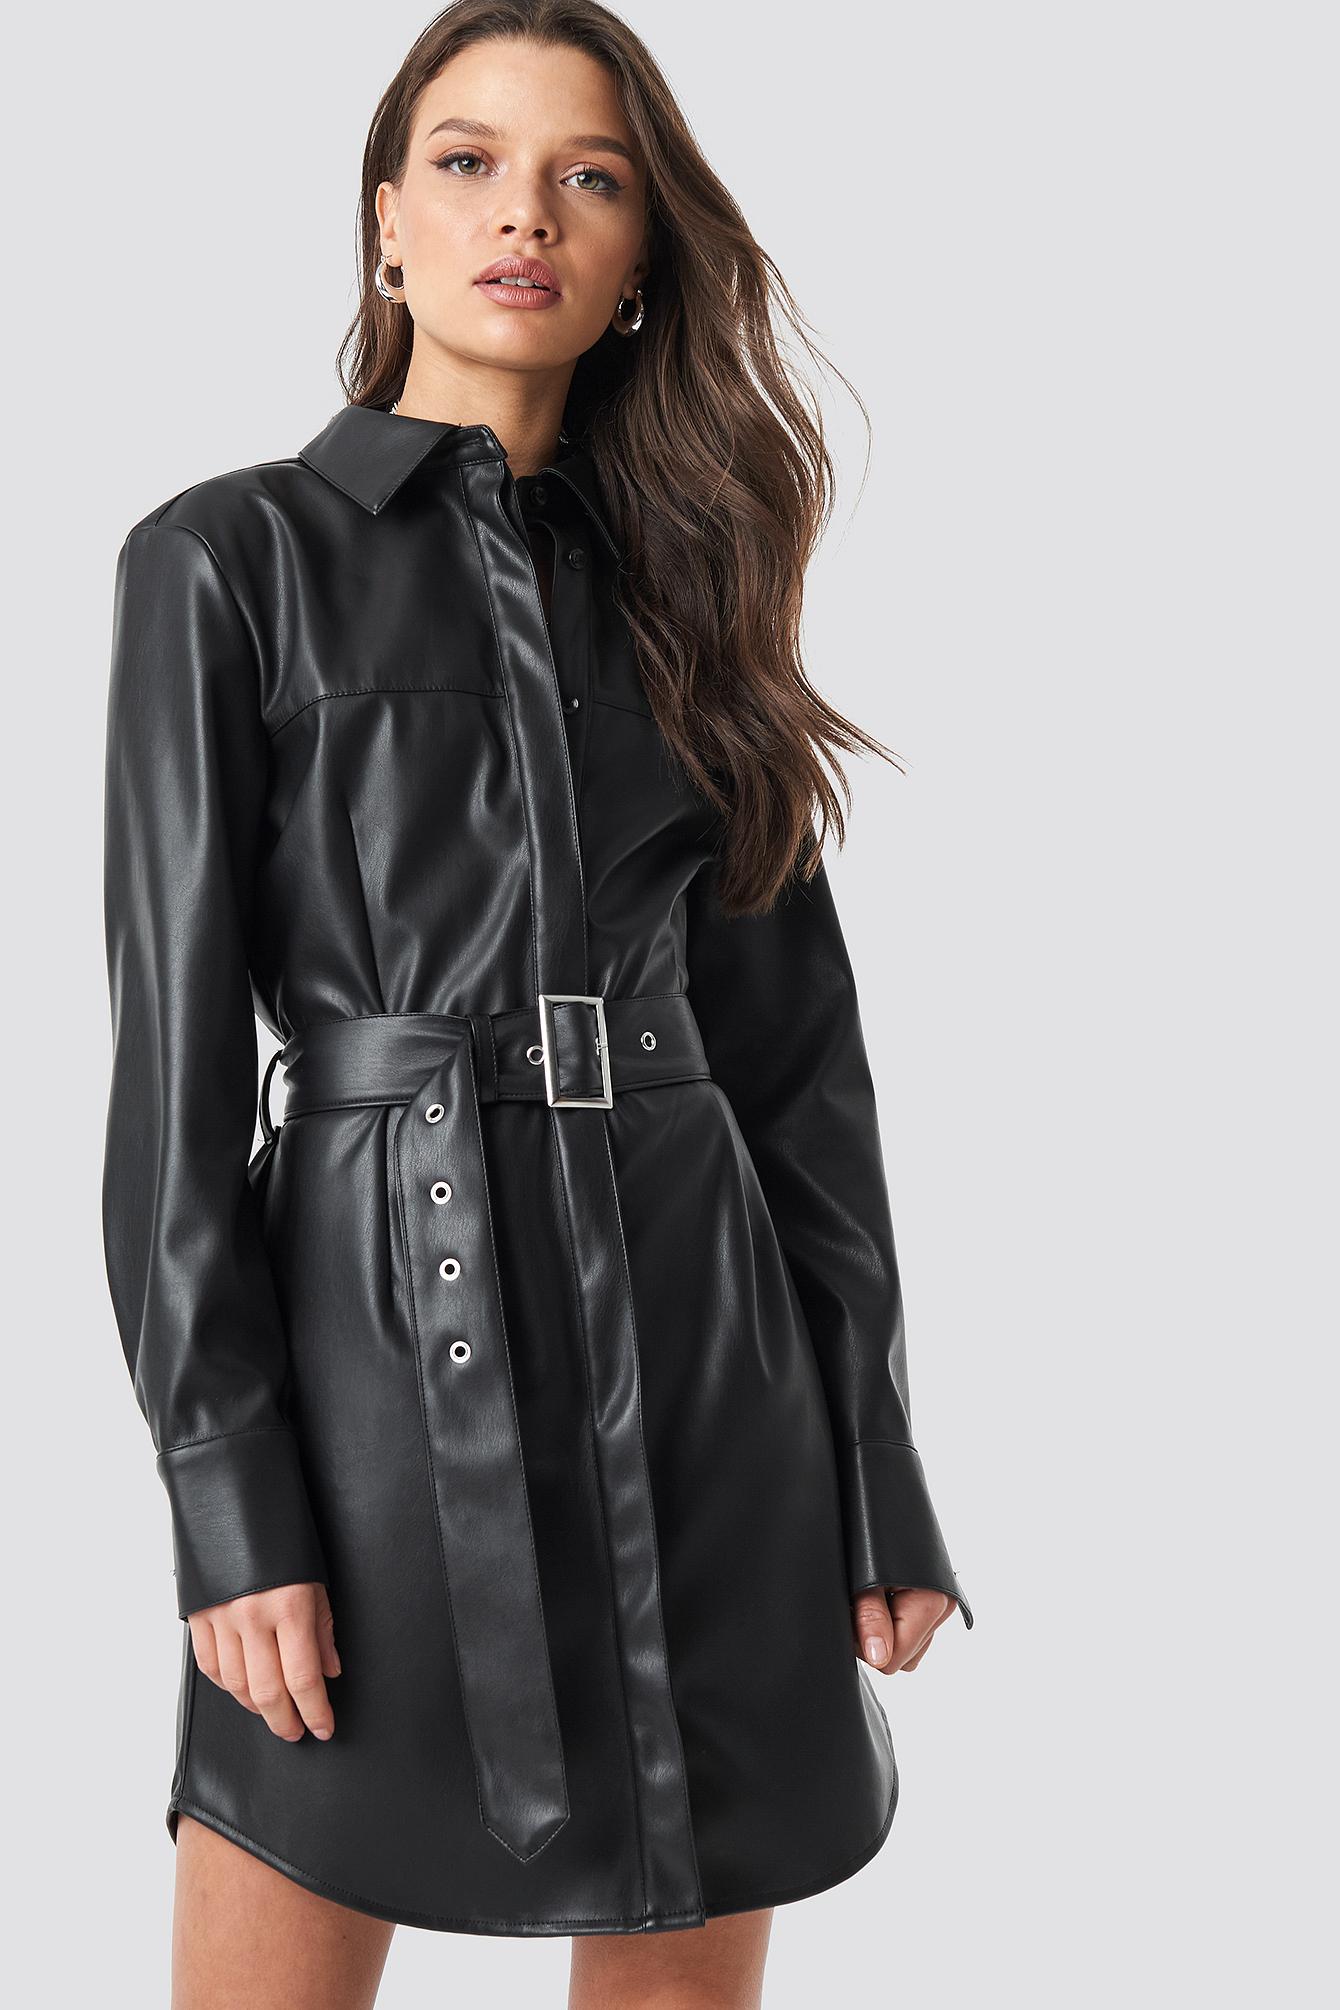 PU Leather Shirt Dress Black